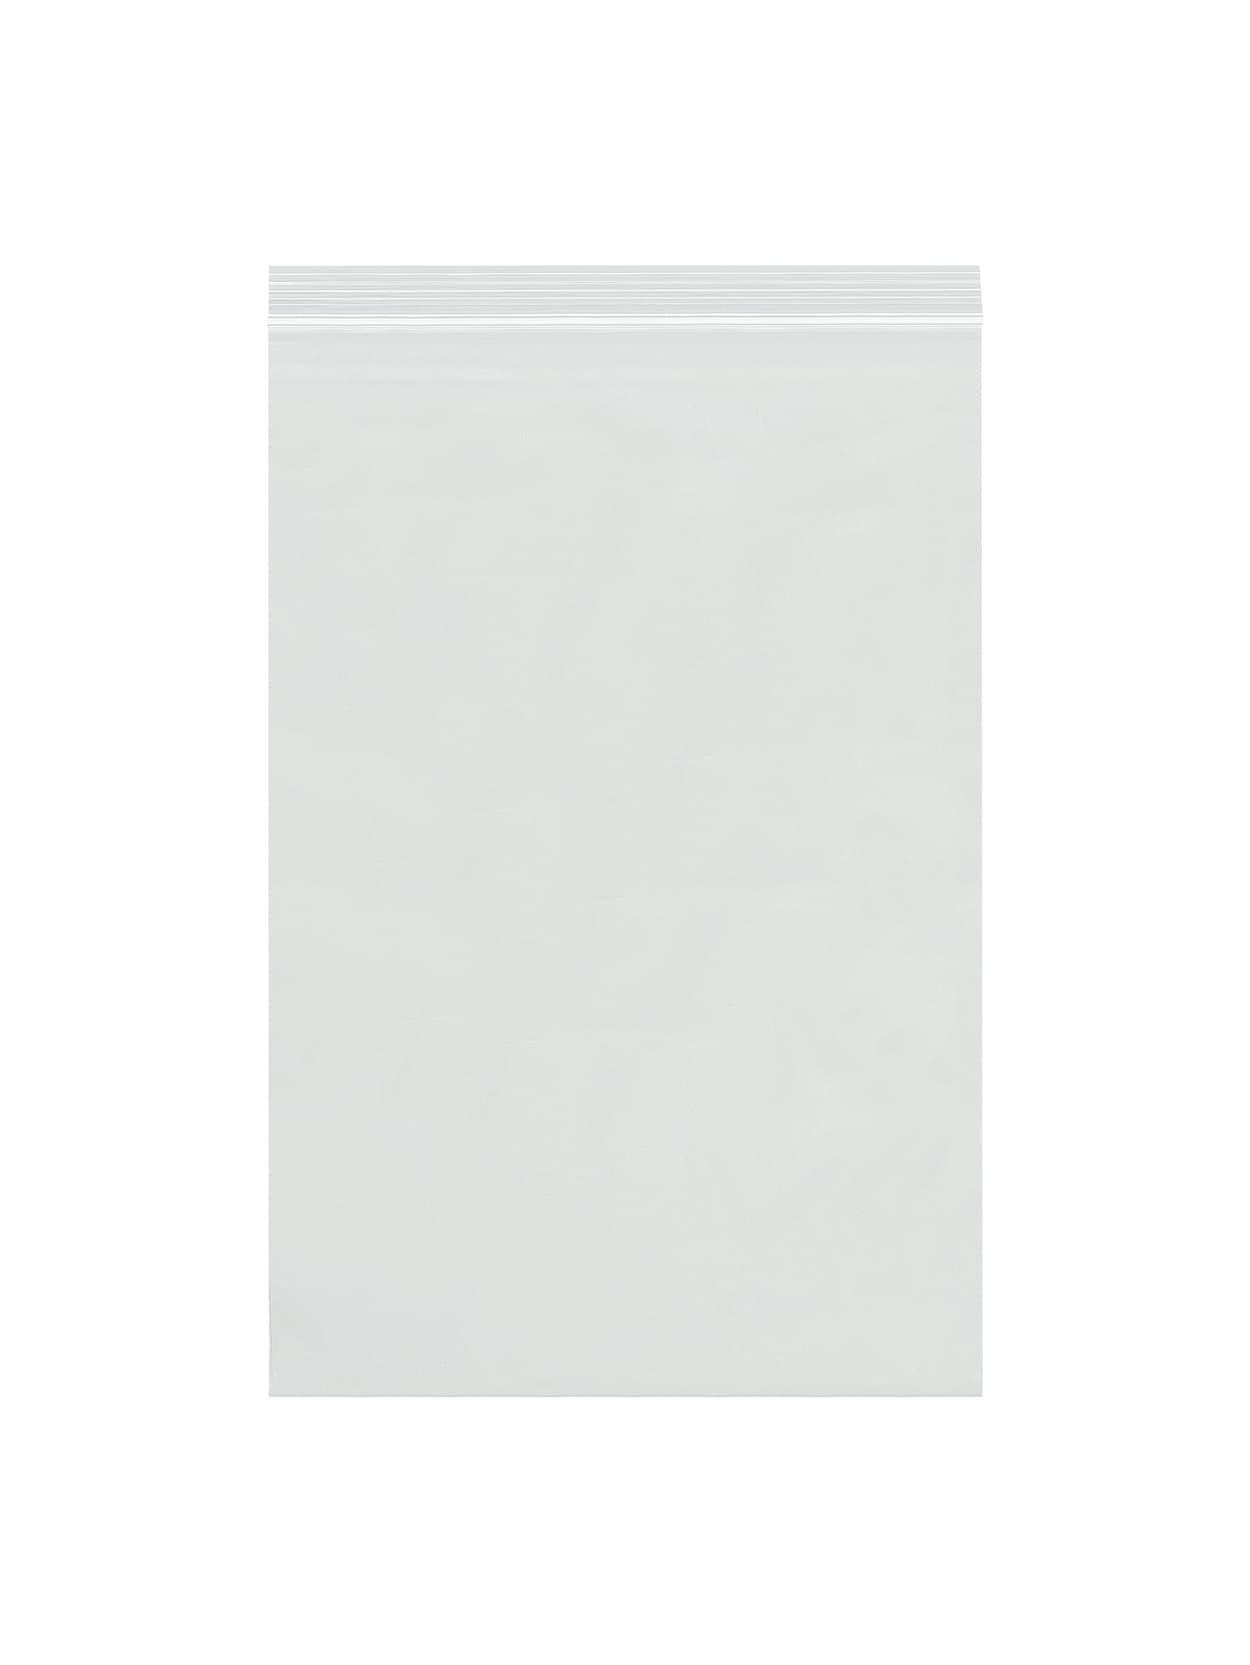 "24/"" x 36/"" inch 100g Clear Polythene Food Use Storage Plastic Bags"